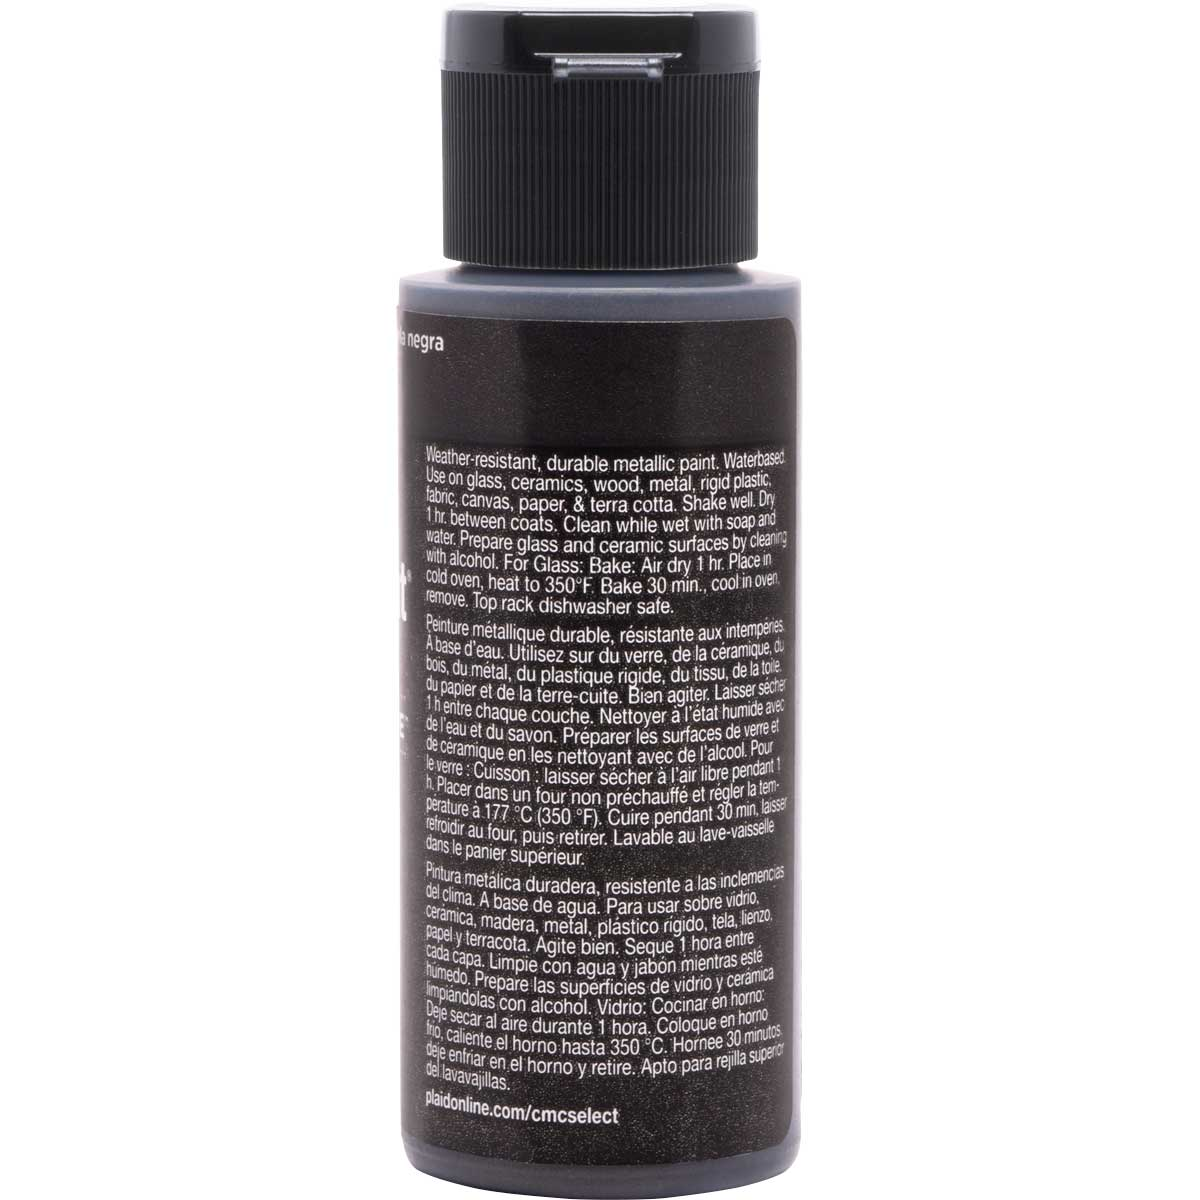 Delta Ceramcoat ® Select Multi-Surface Acrylic Paint - Metallic - Black Pearl, 2 oz. - 04114